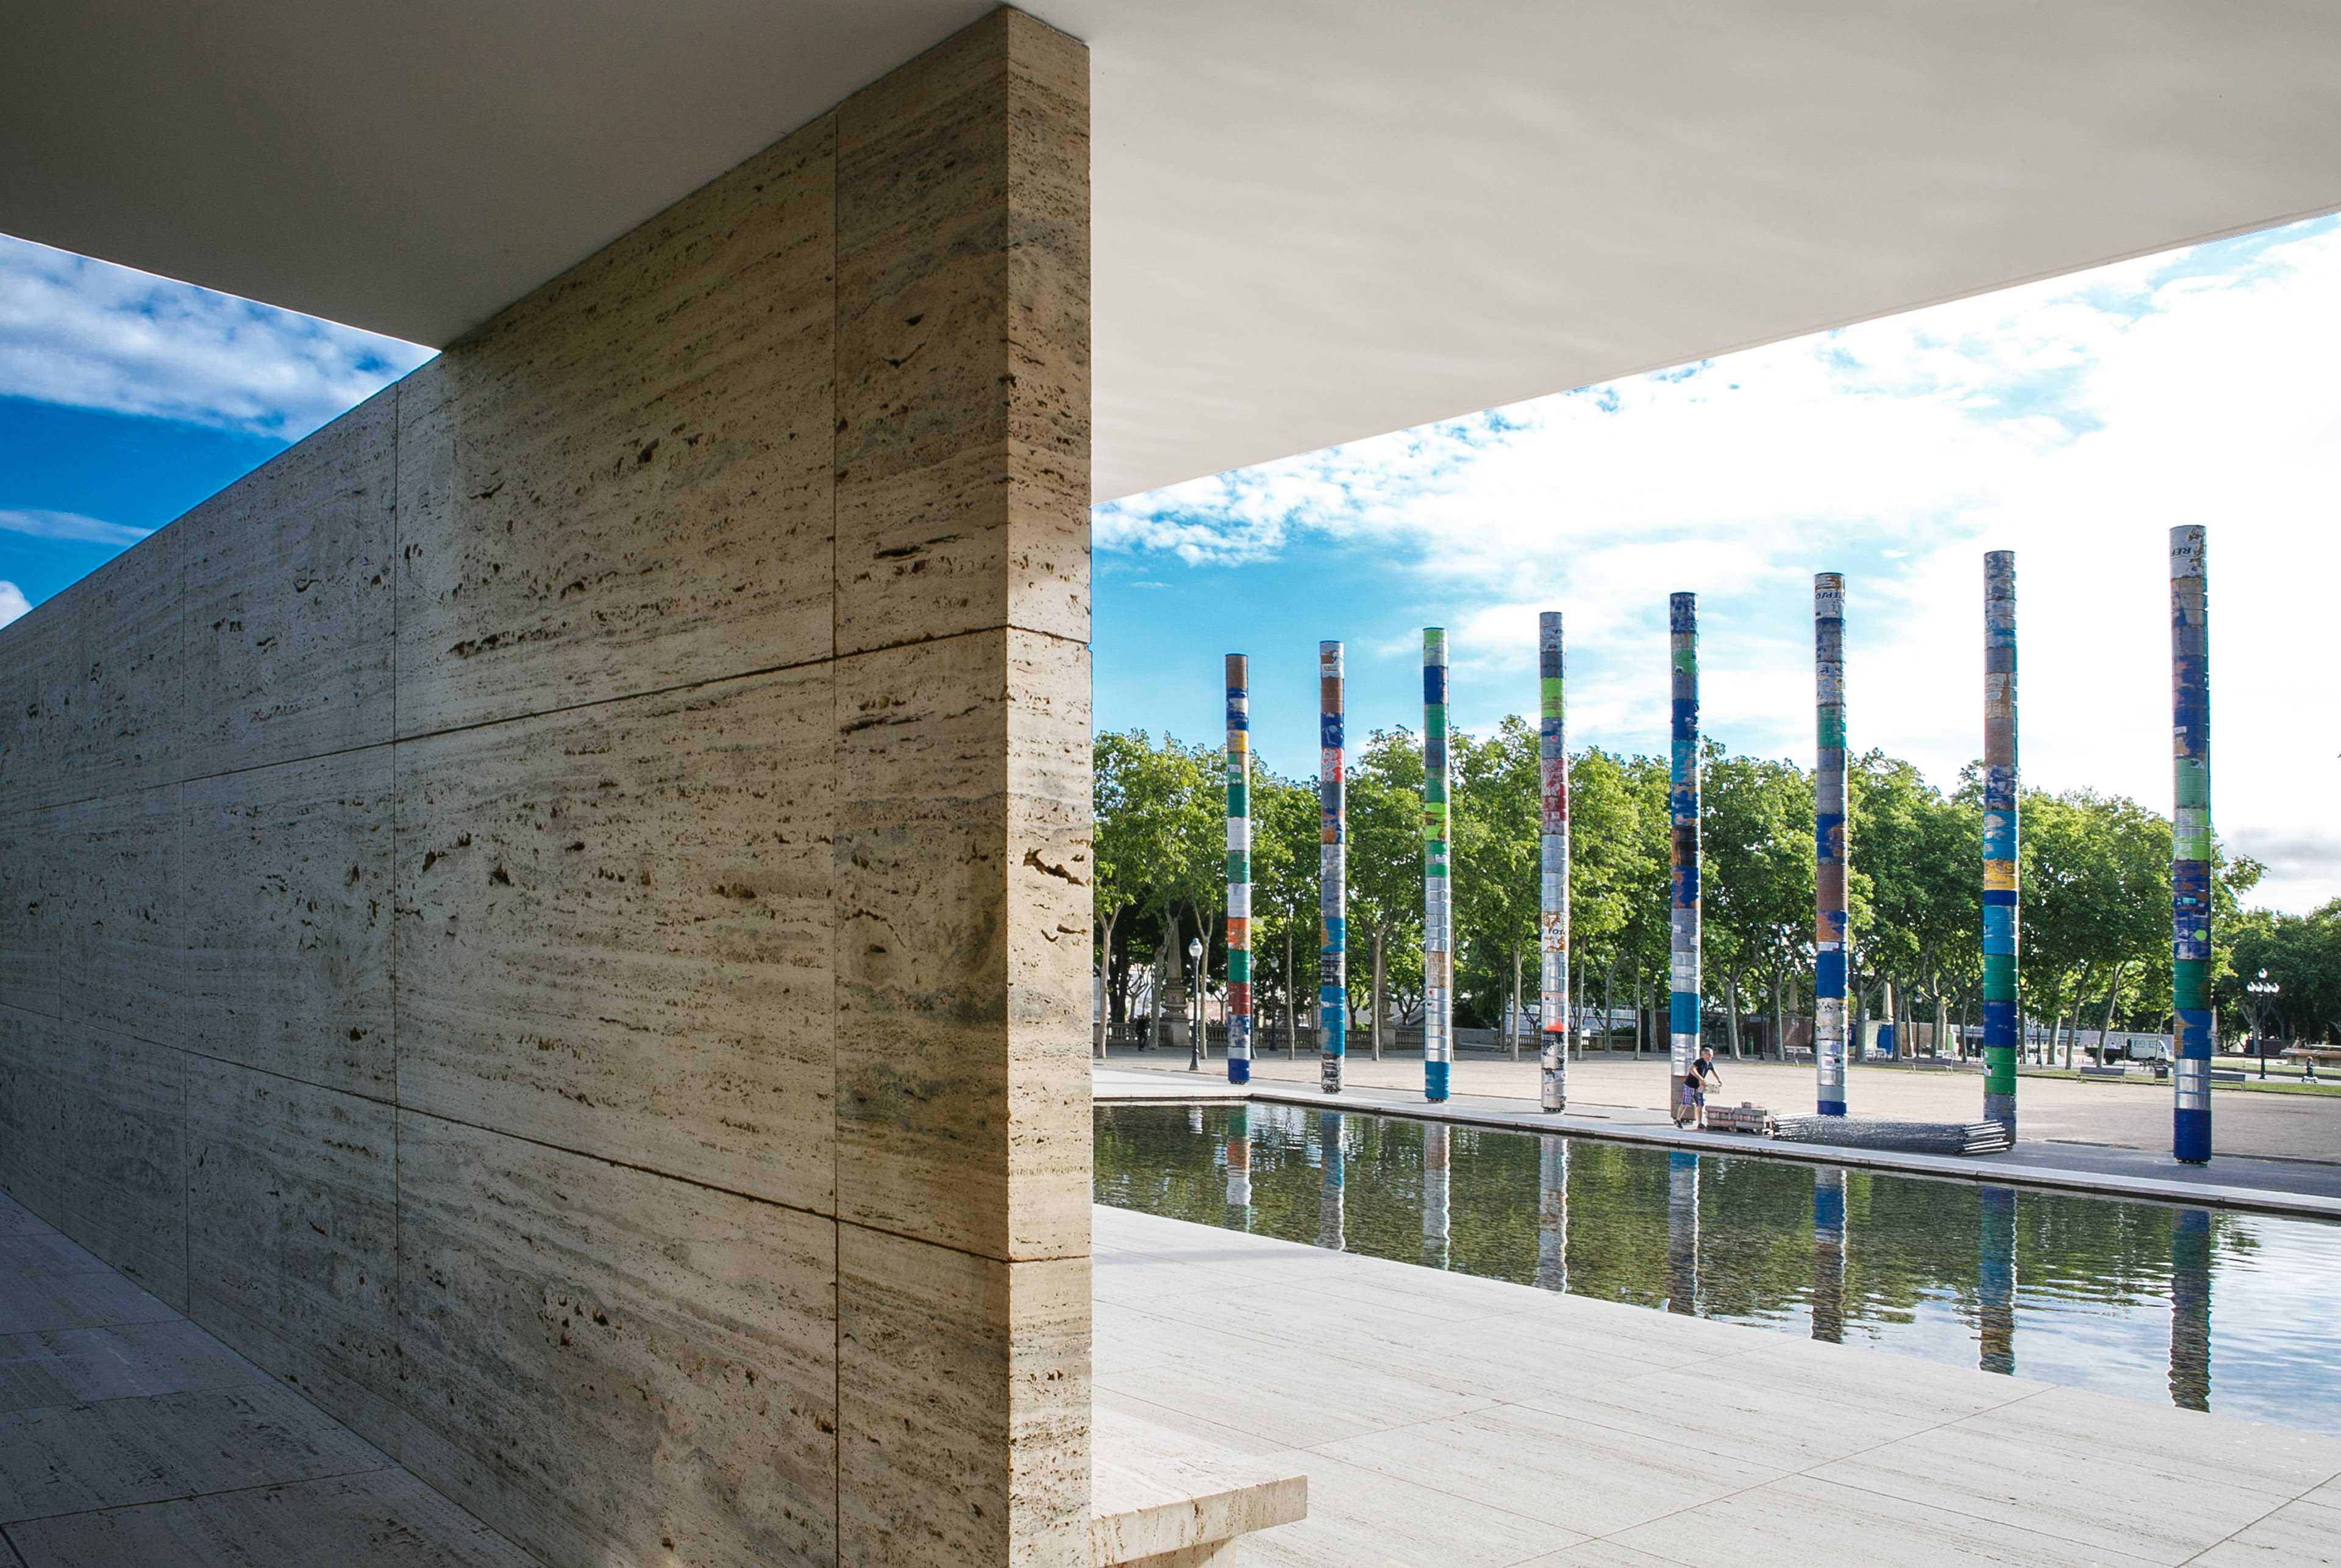 Conmemorative columns Barcelona Pavilion  - 70 03 34